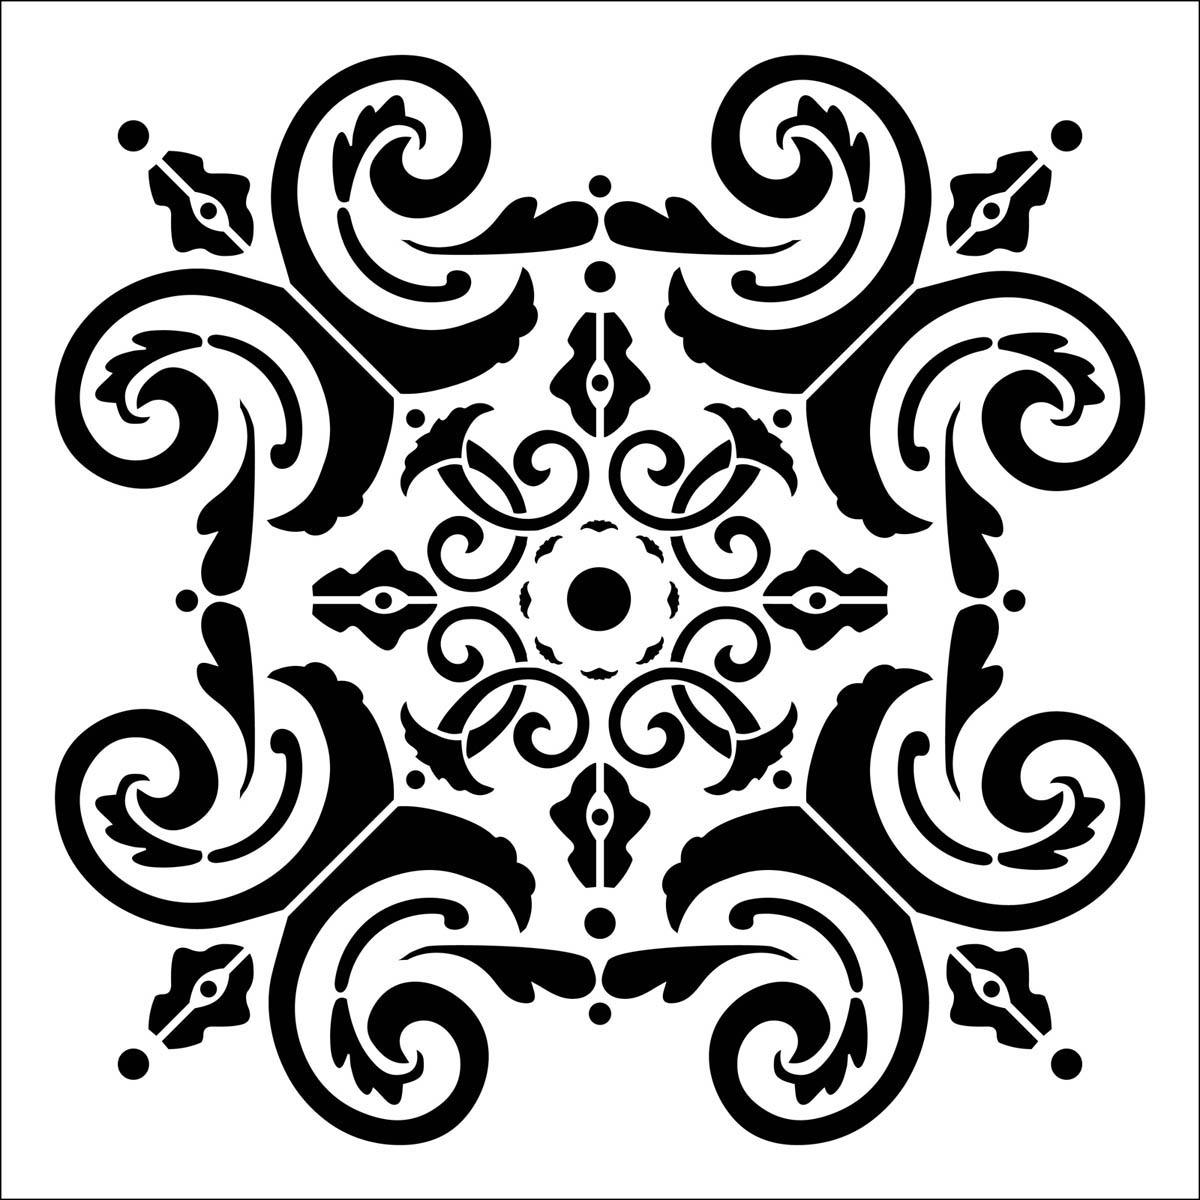 FolkArt ® Painting Stencils - Large - Fresh Elegance